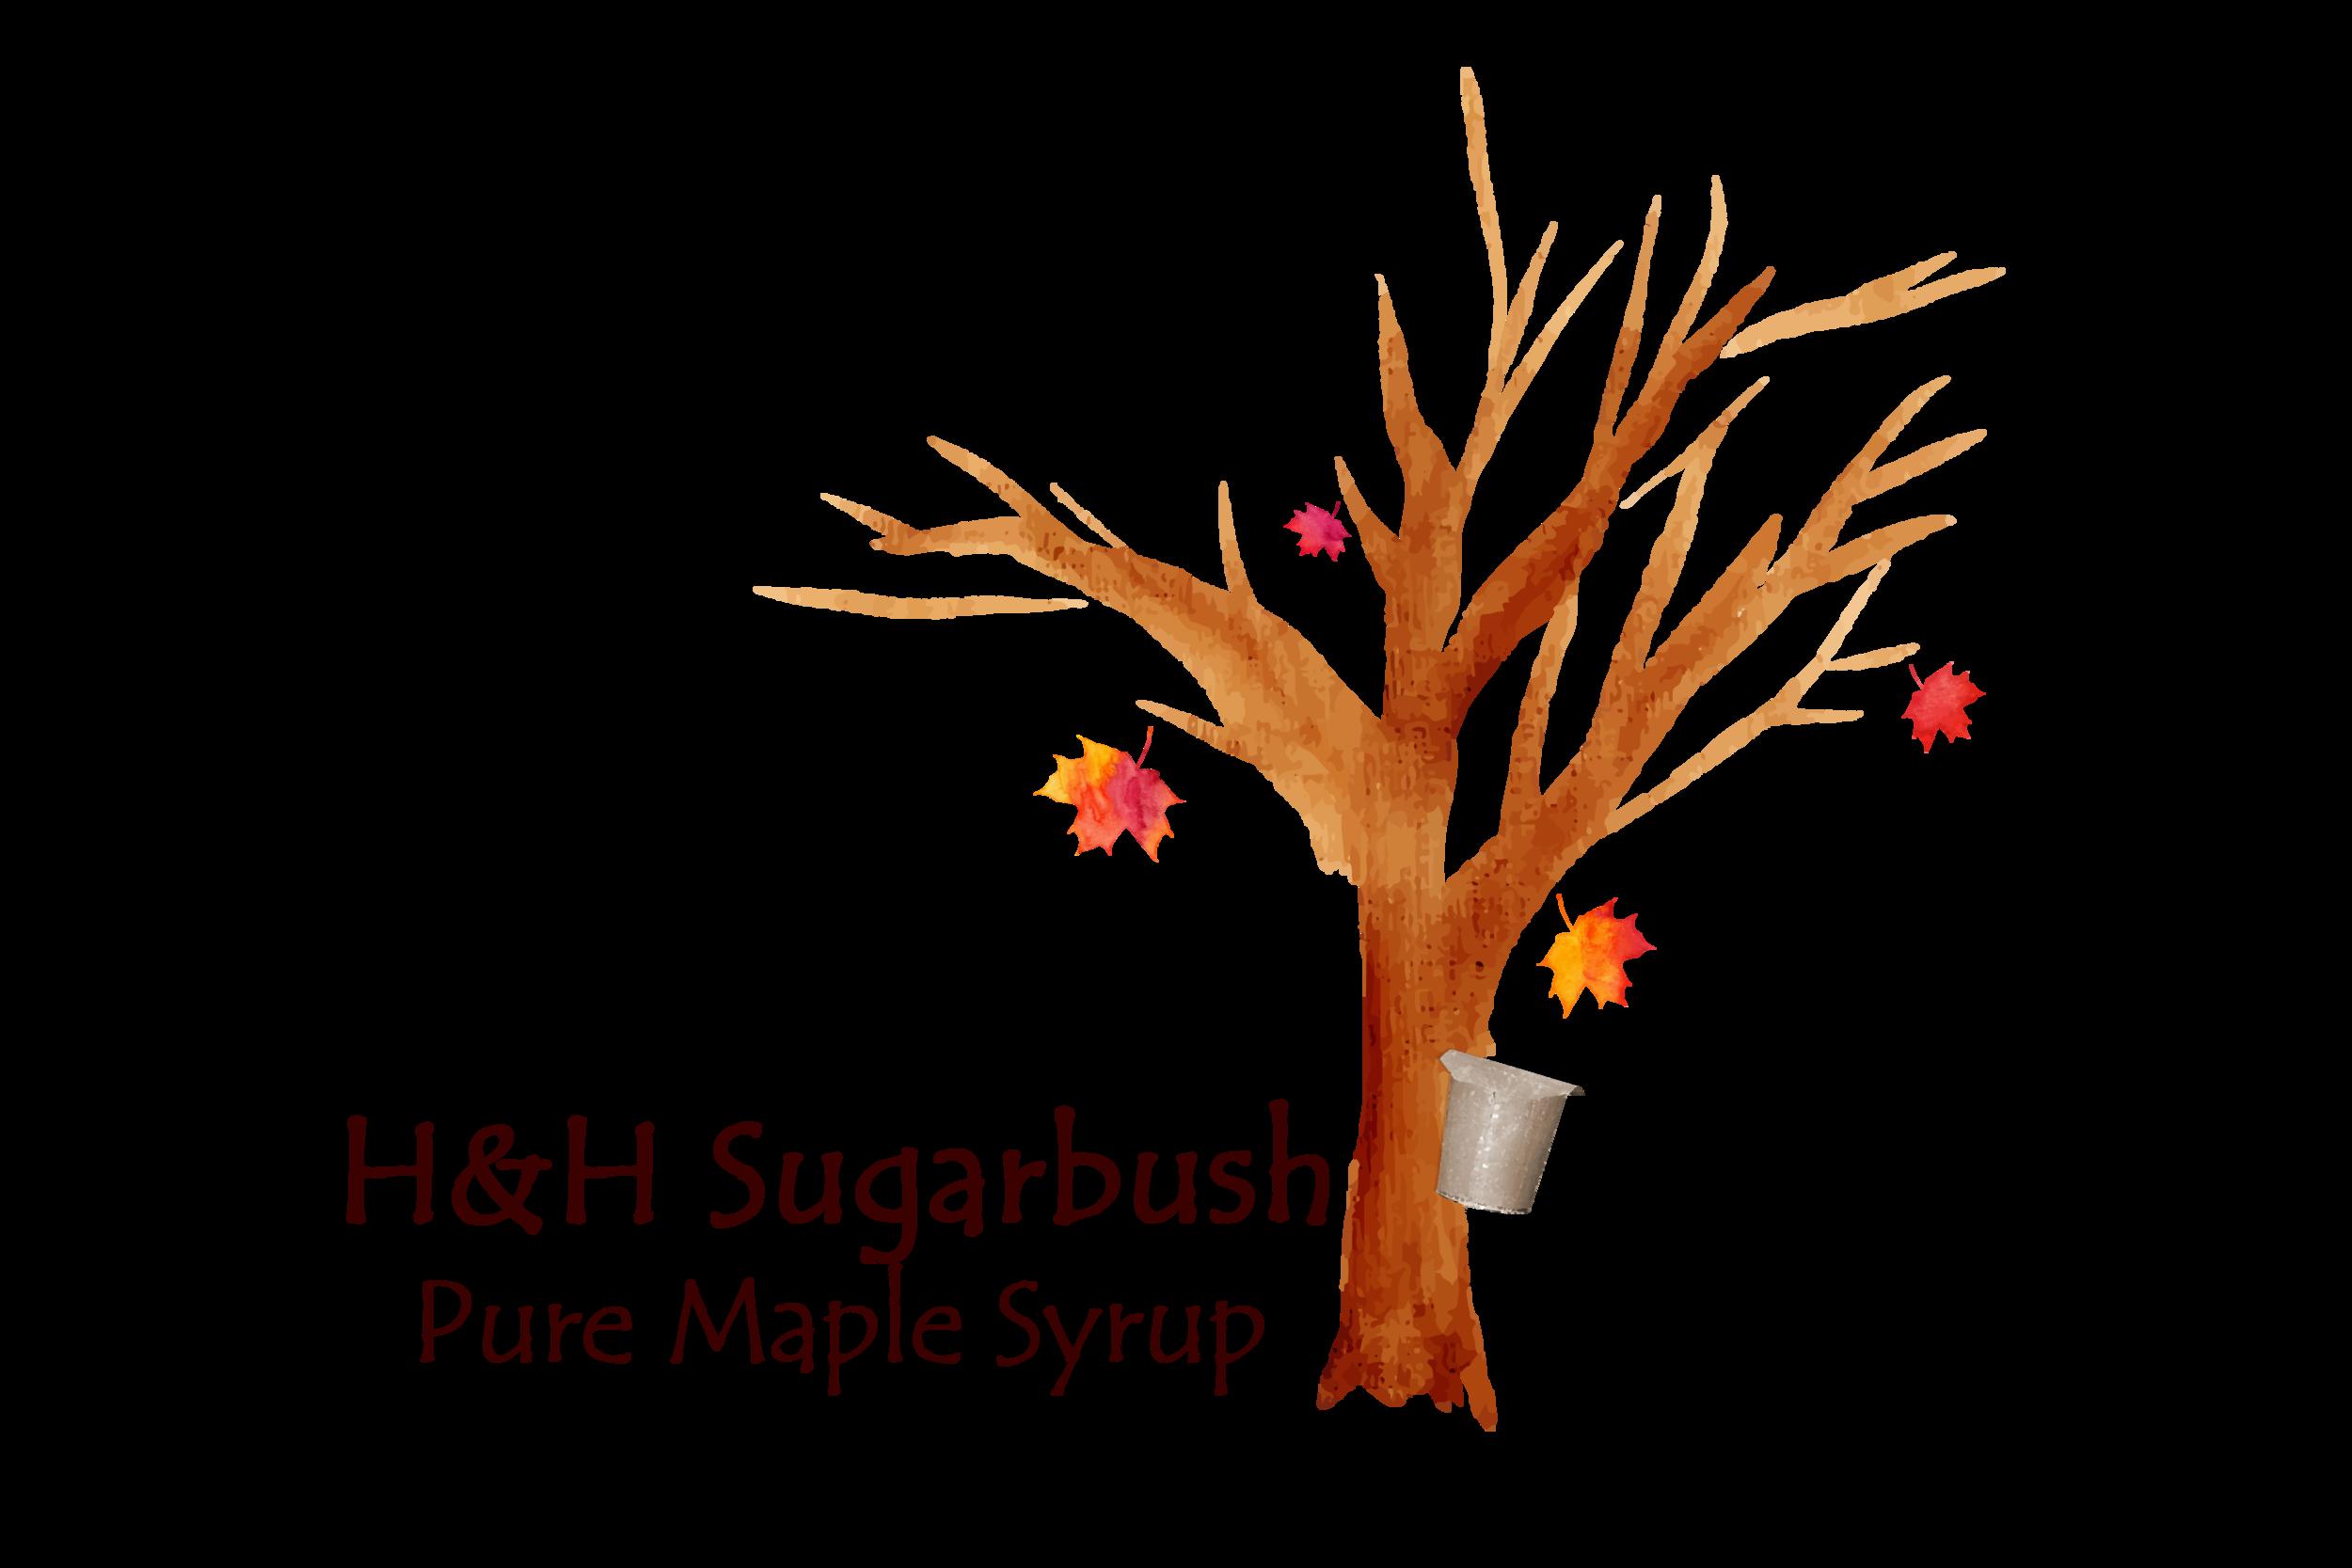 FINAL_logo_HH_Sugarbush.png